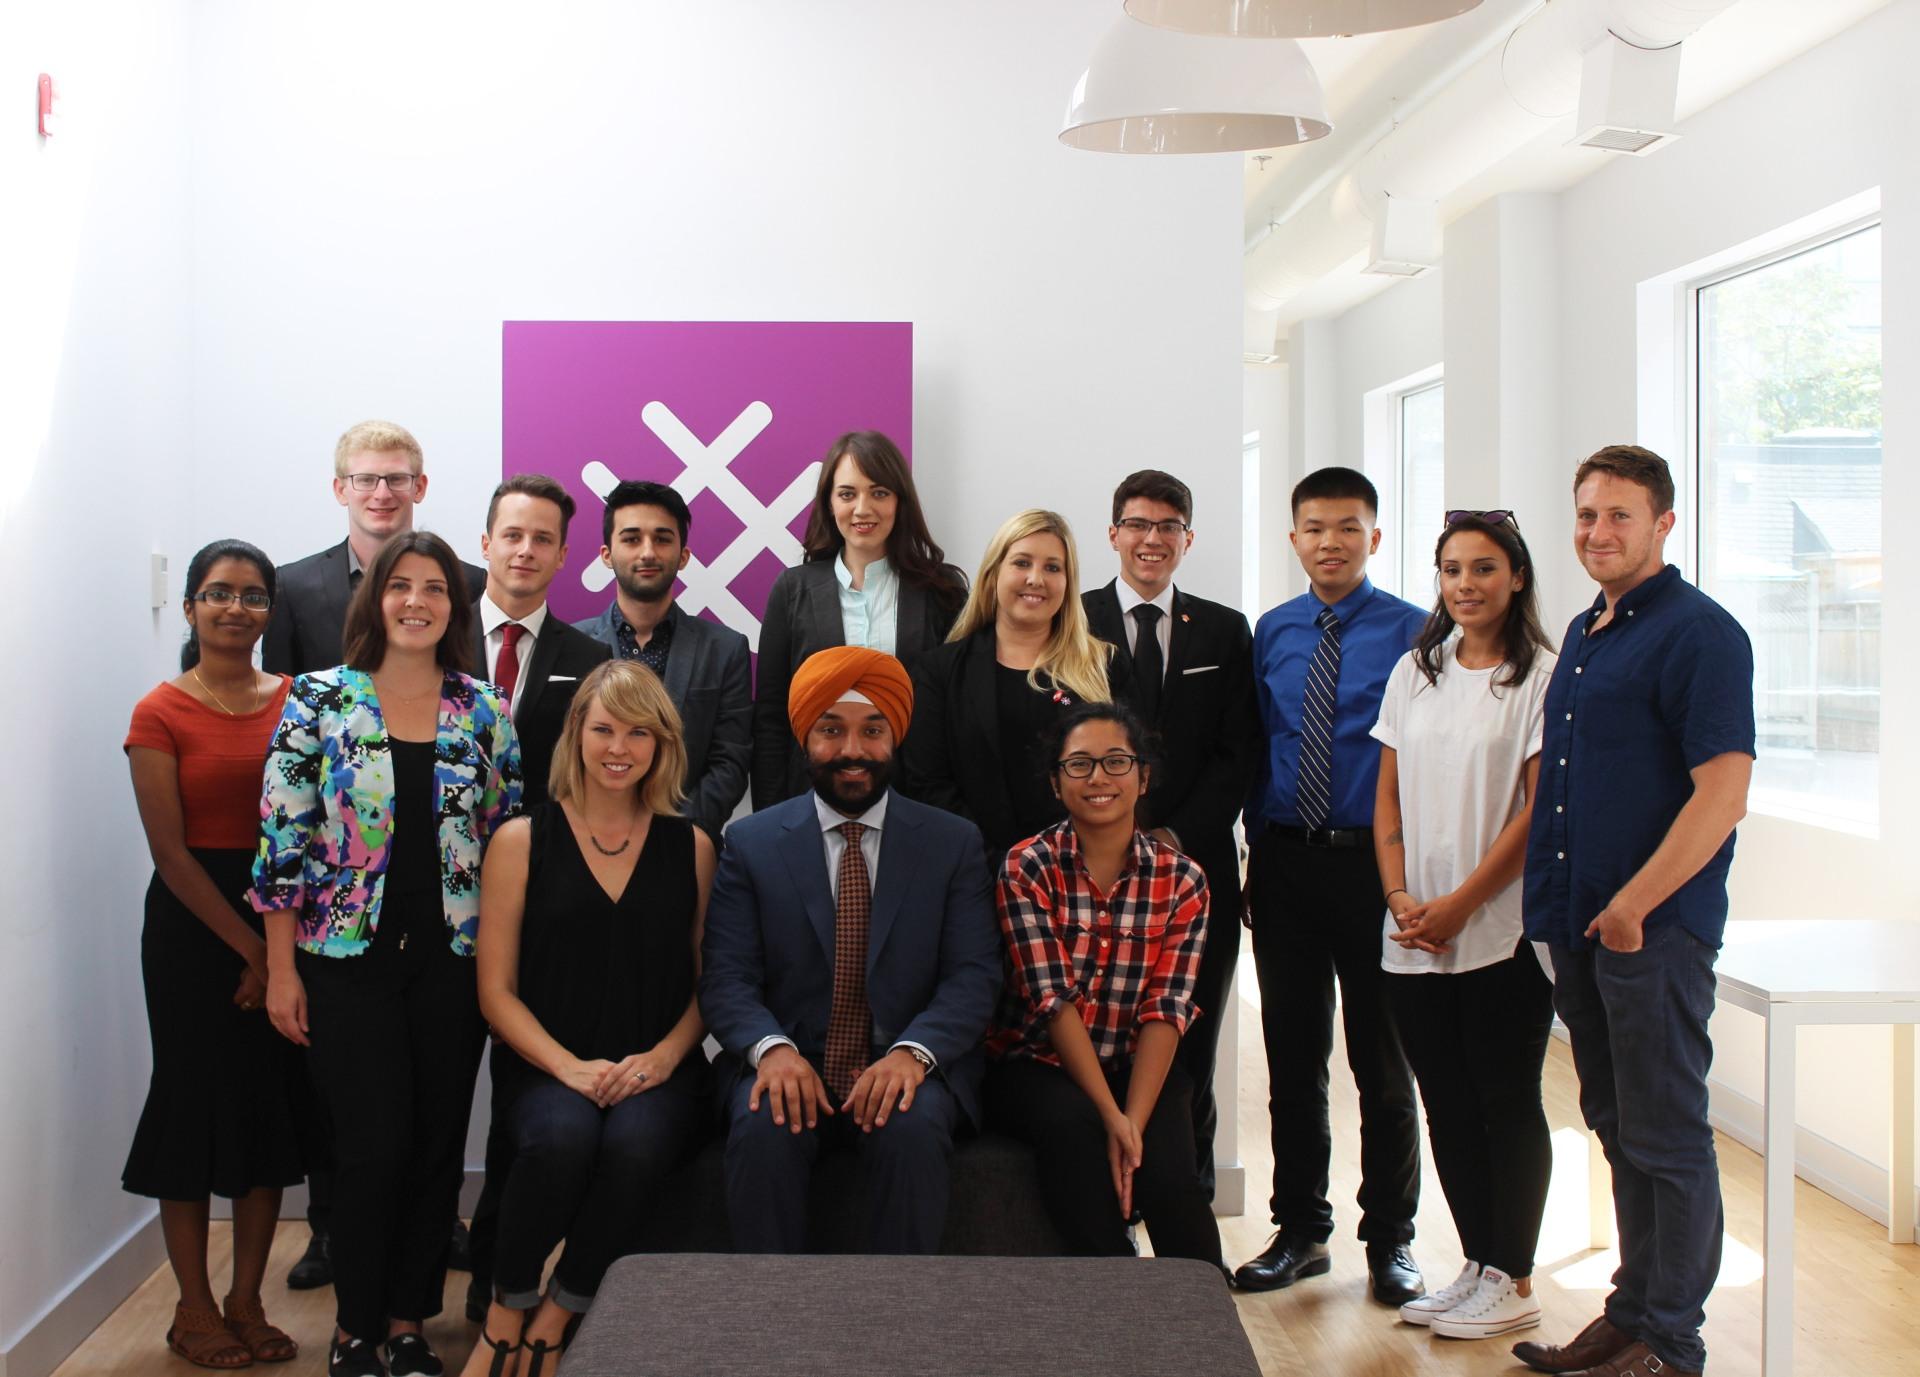 canada_innovation_agenda_youth_entrepreneur_minister_bains_1